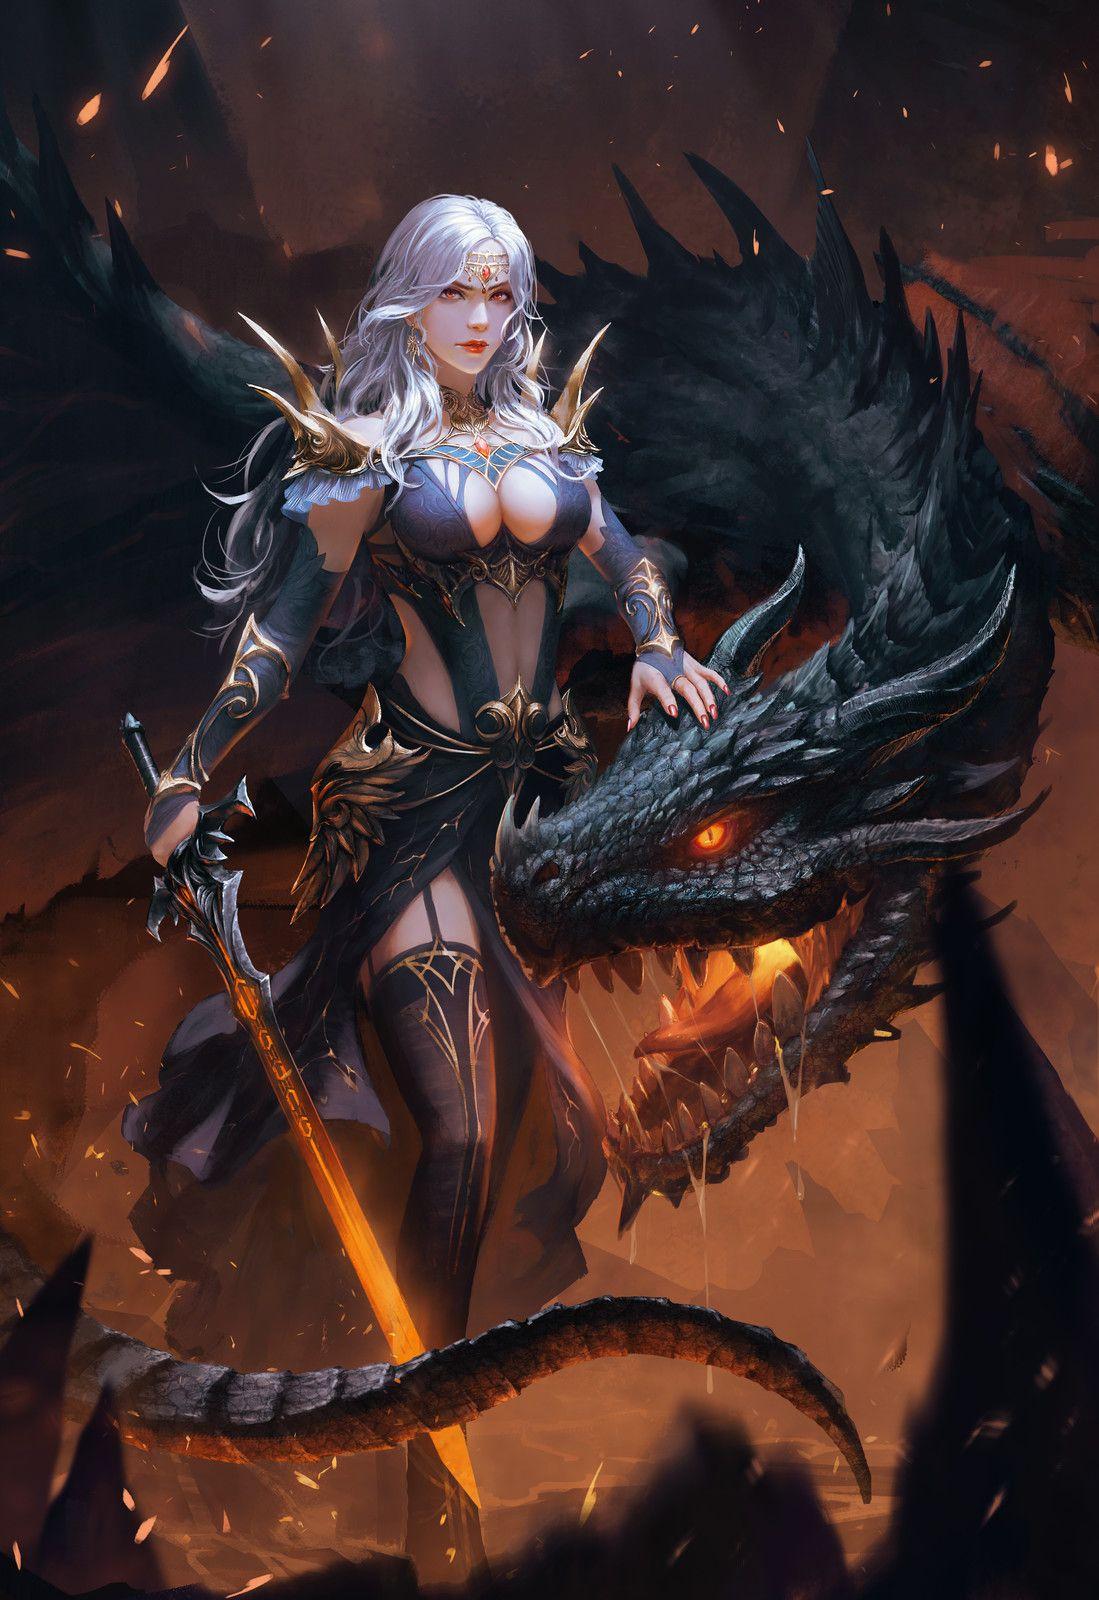 Photo of The Pargas Queen, ZACK FAIR